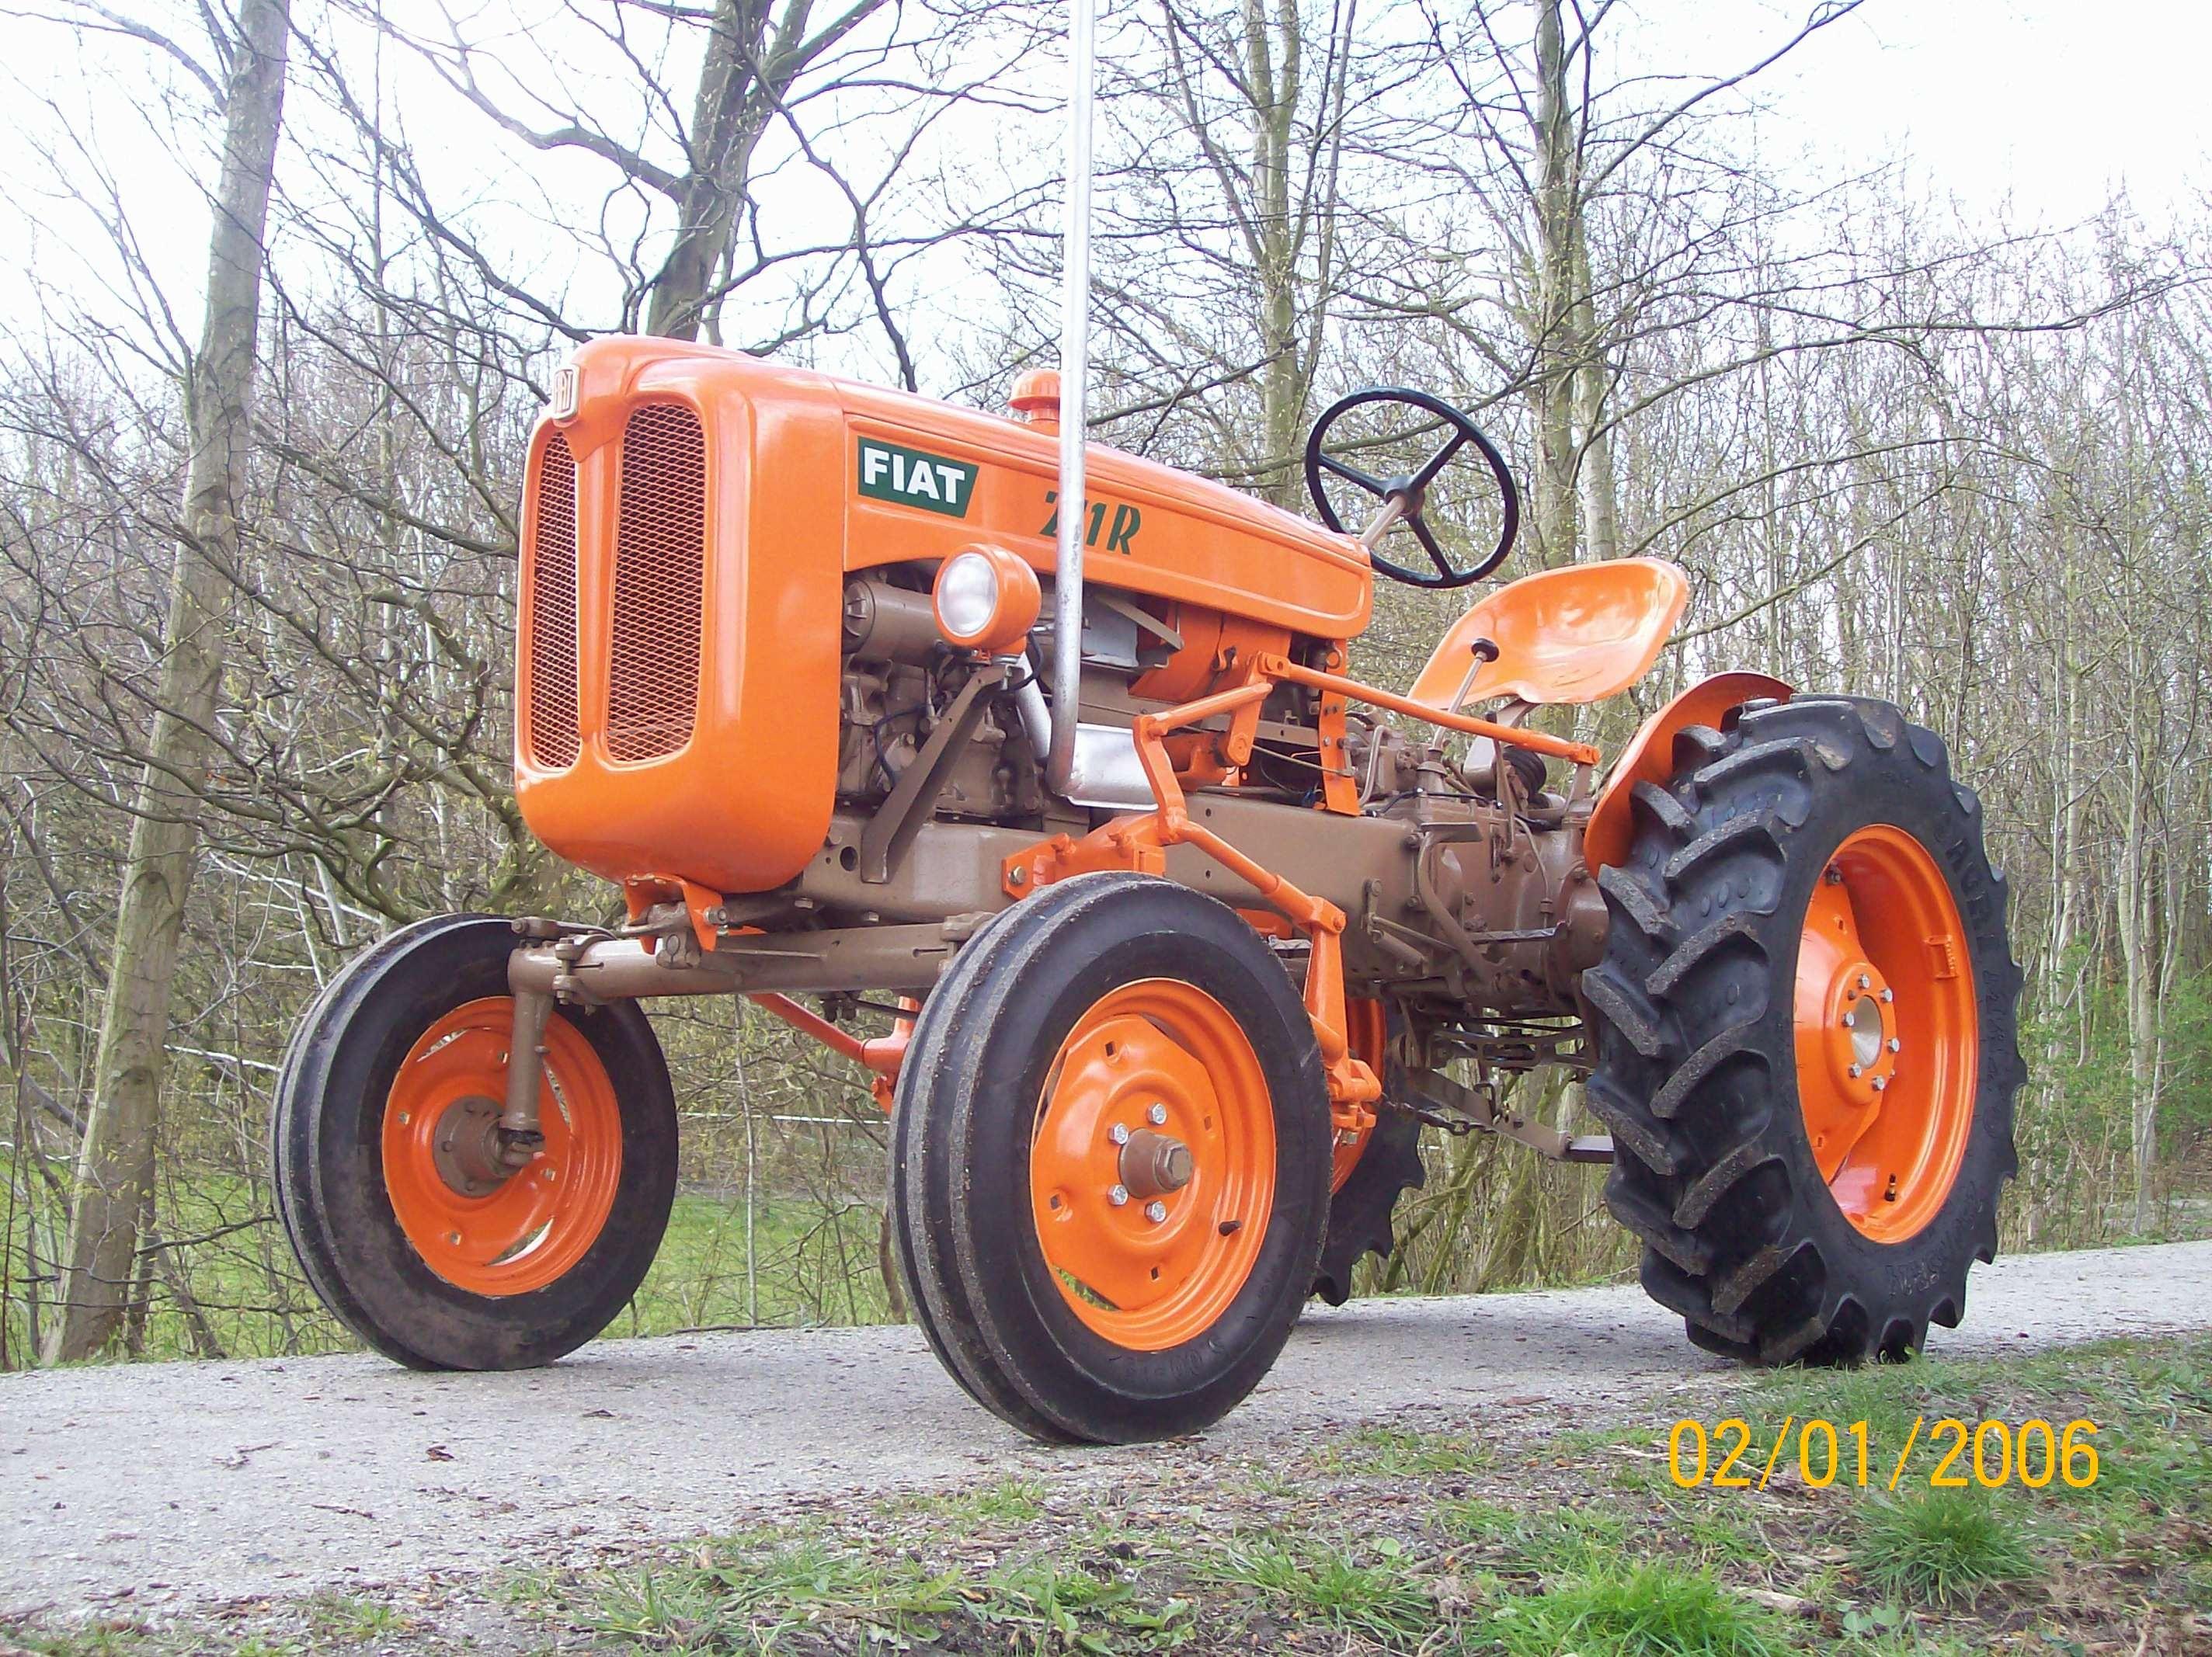 original lot gb auction catalogue dt tractor fiat no id crosstate agri catalogues serial en